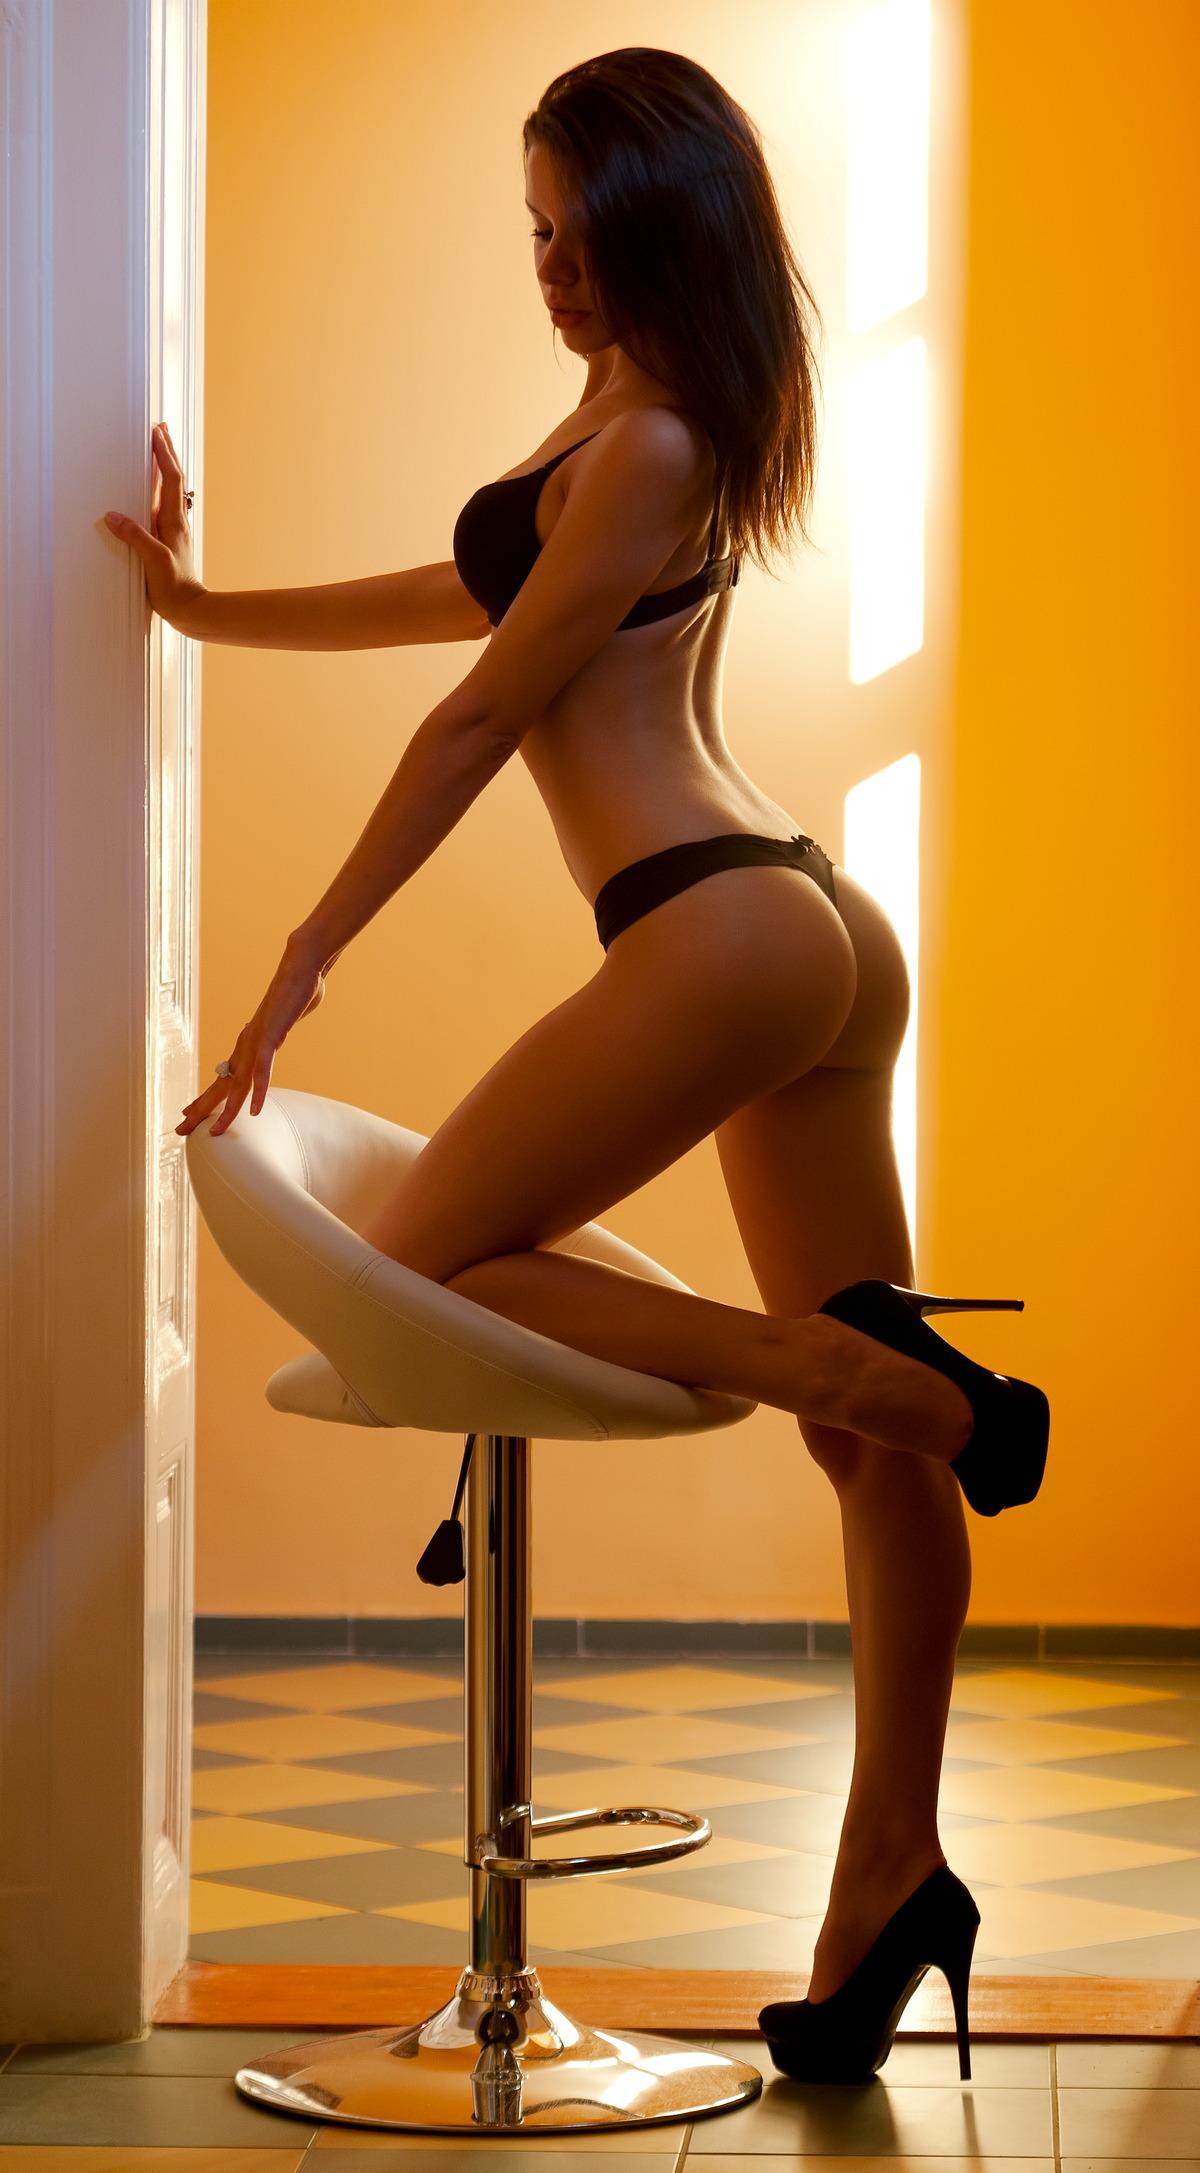 Sexy Girl auf Barhocker